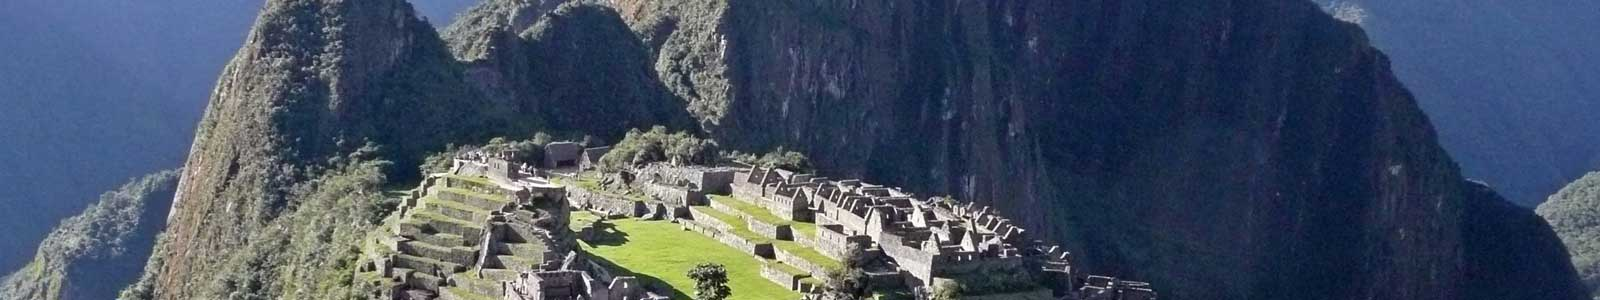 Machu Picchu, After the Flood